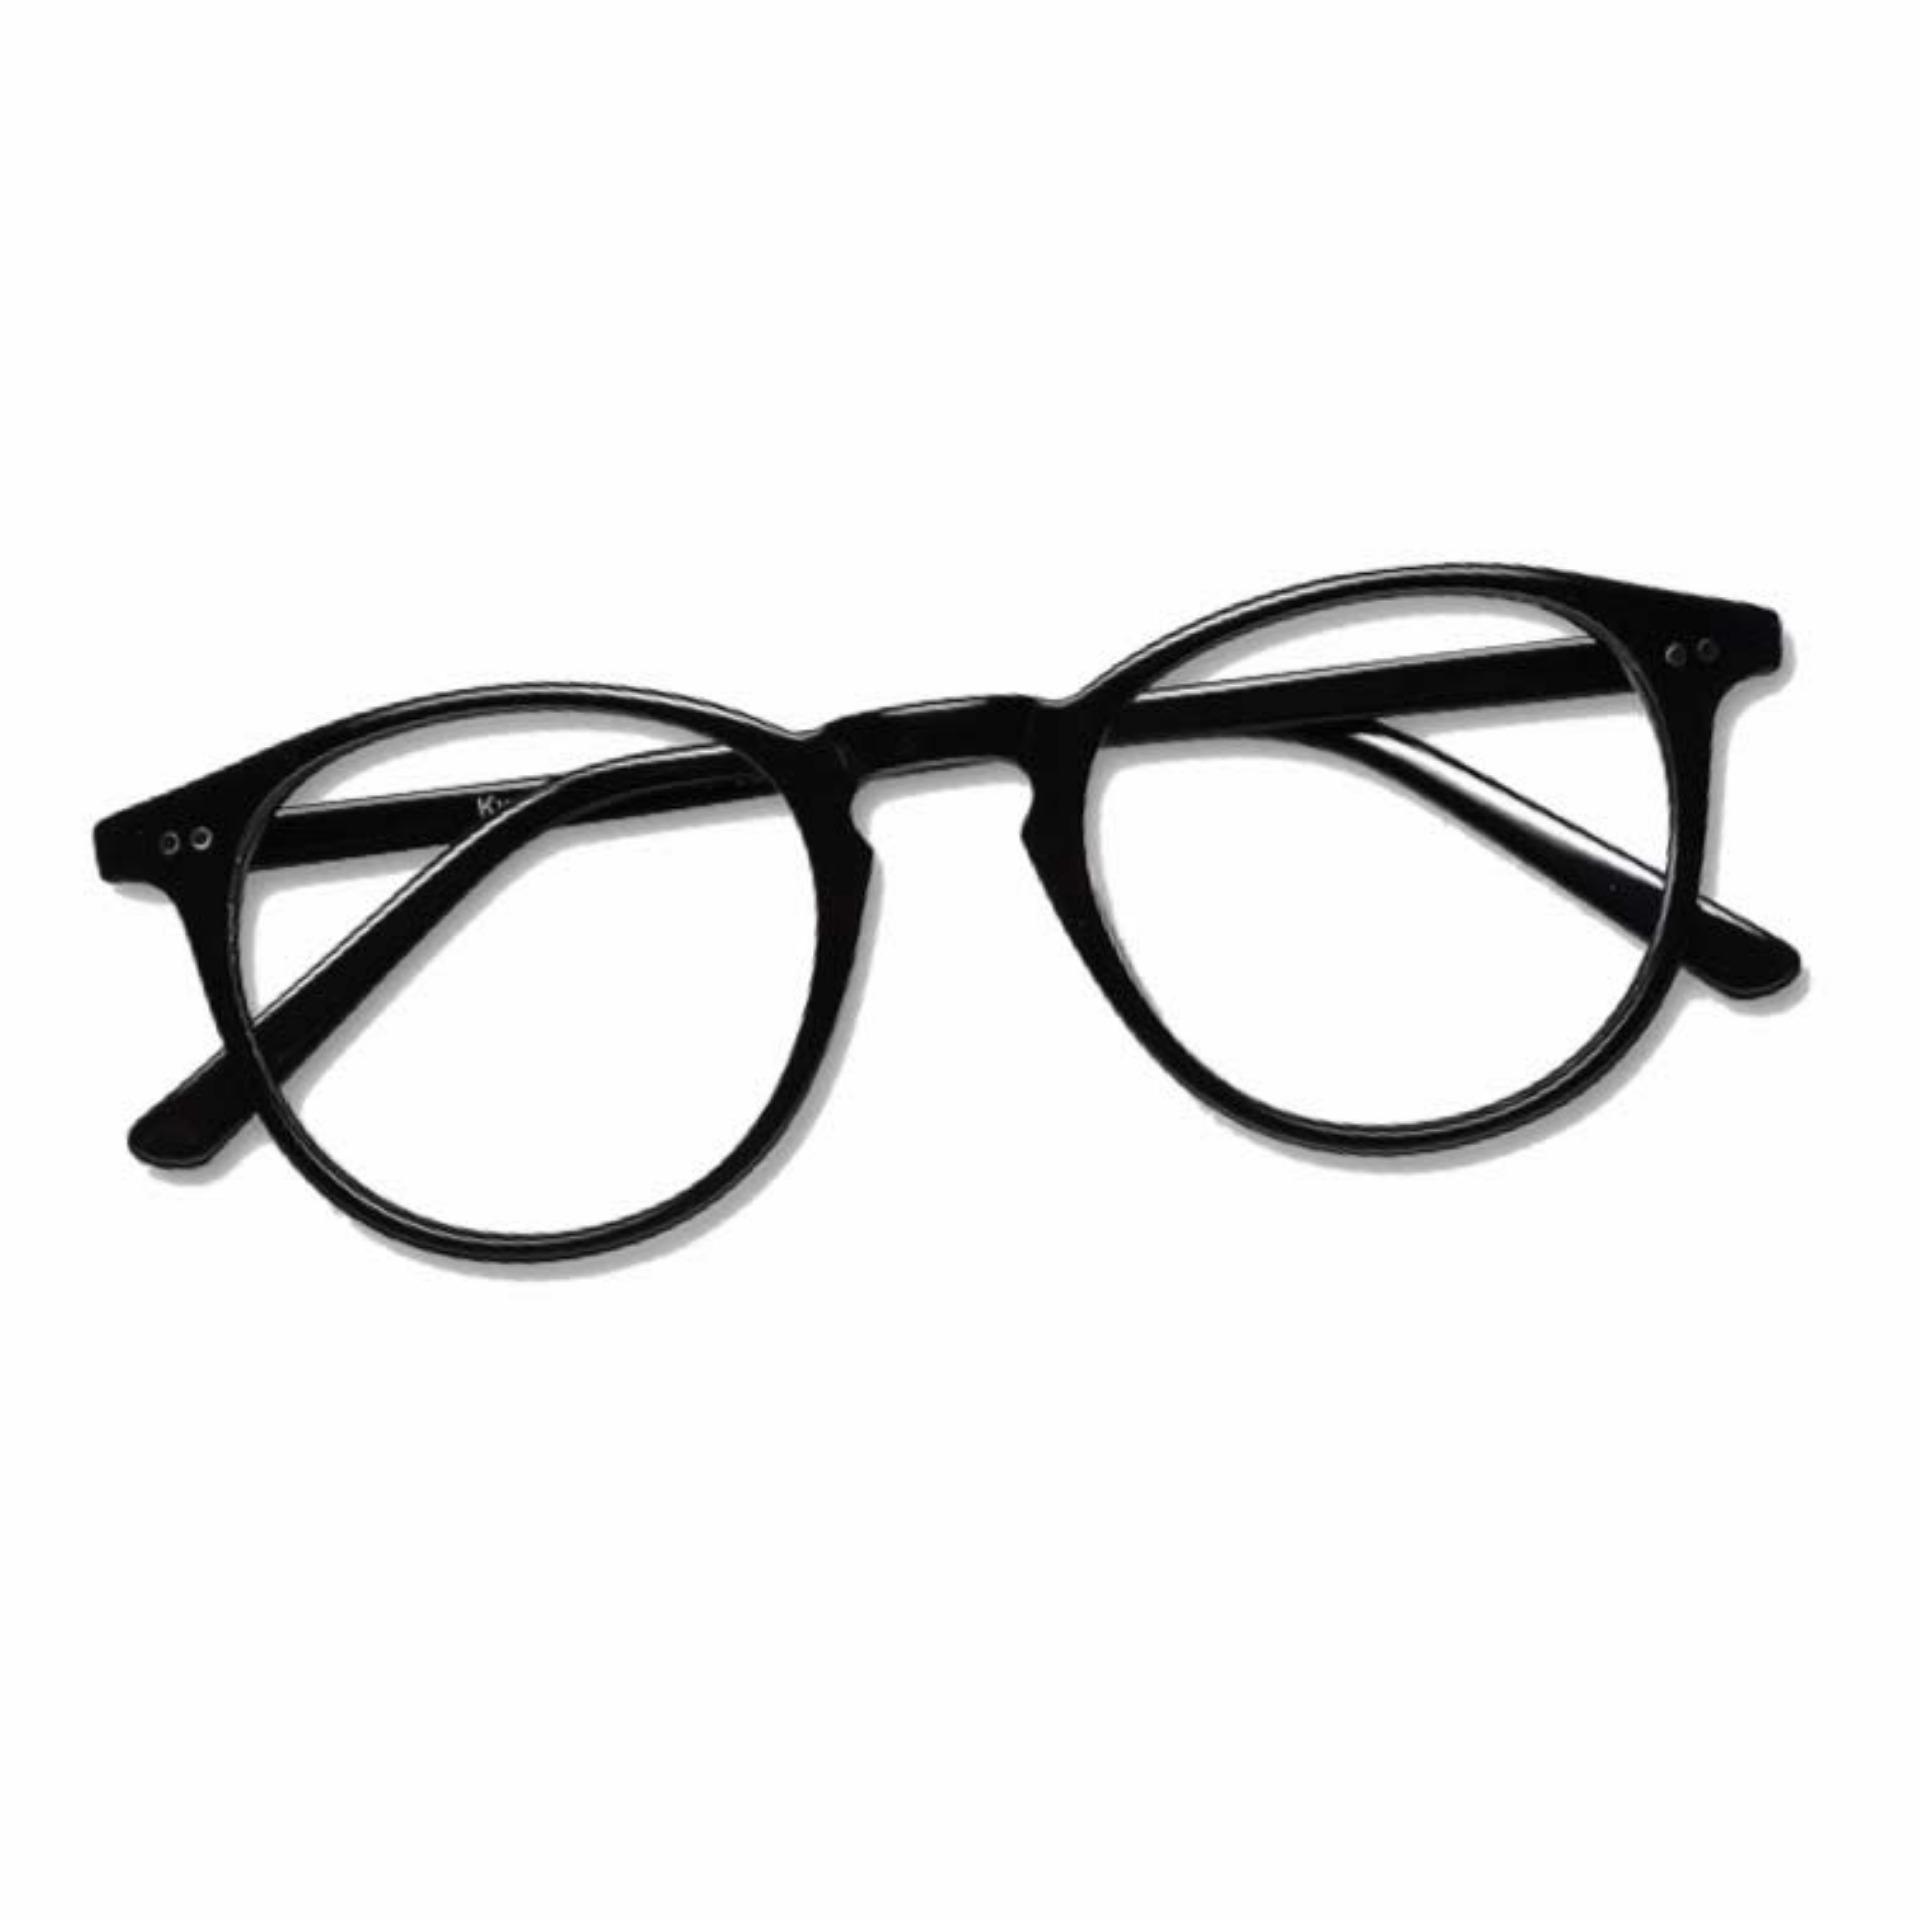 Korea Fashion Style - Kacamata Oval - Fashion - Pria dan Wanita - Unisex -  Clasic b9cb925c5d